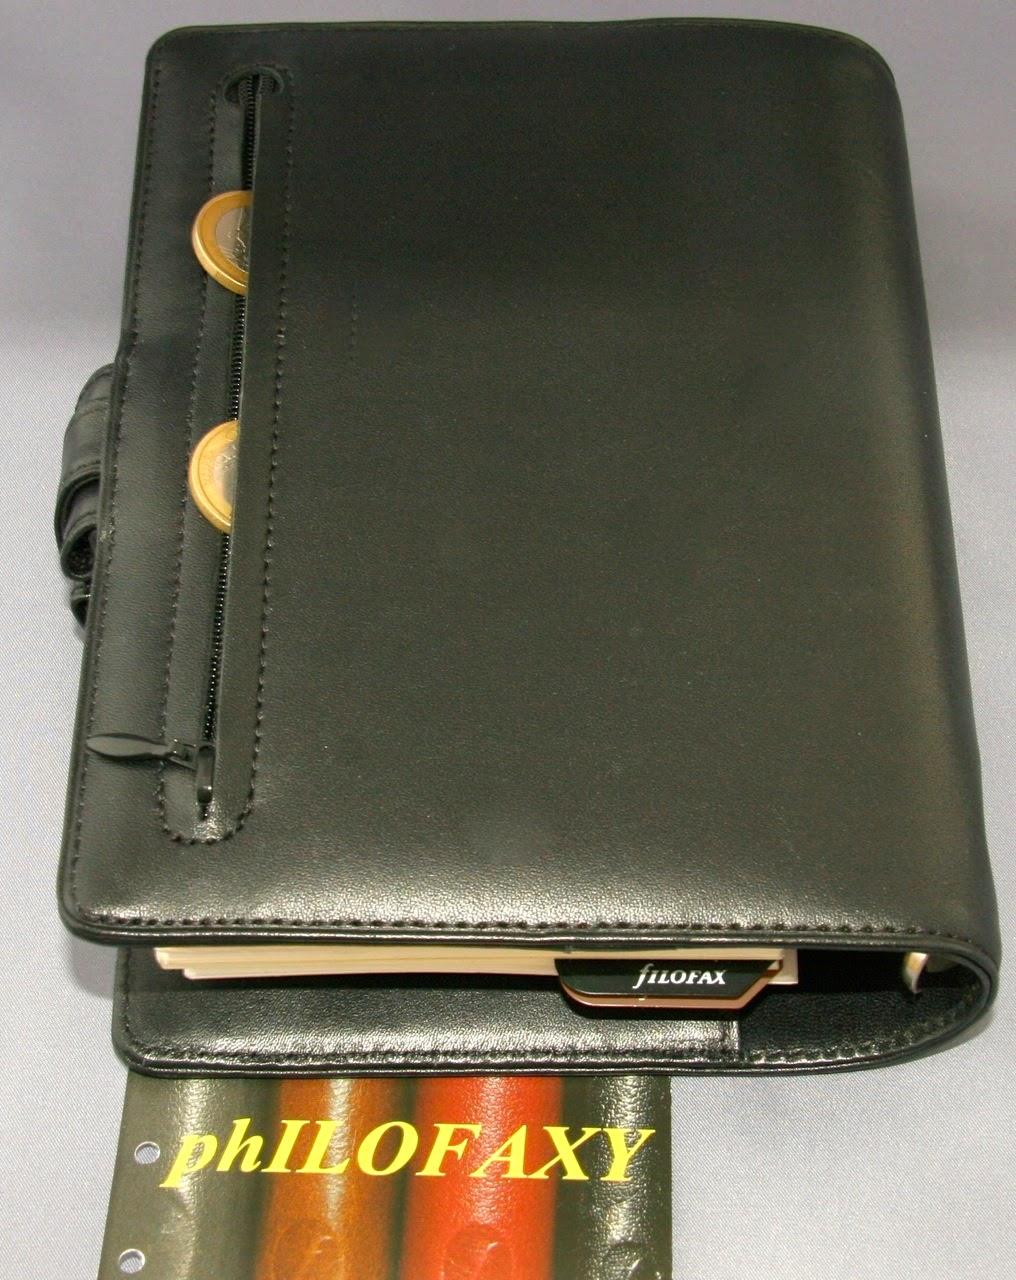 Philofaxy Filofax Personal Size As An Organiser Wallet